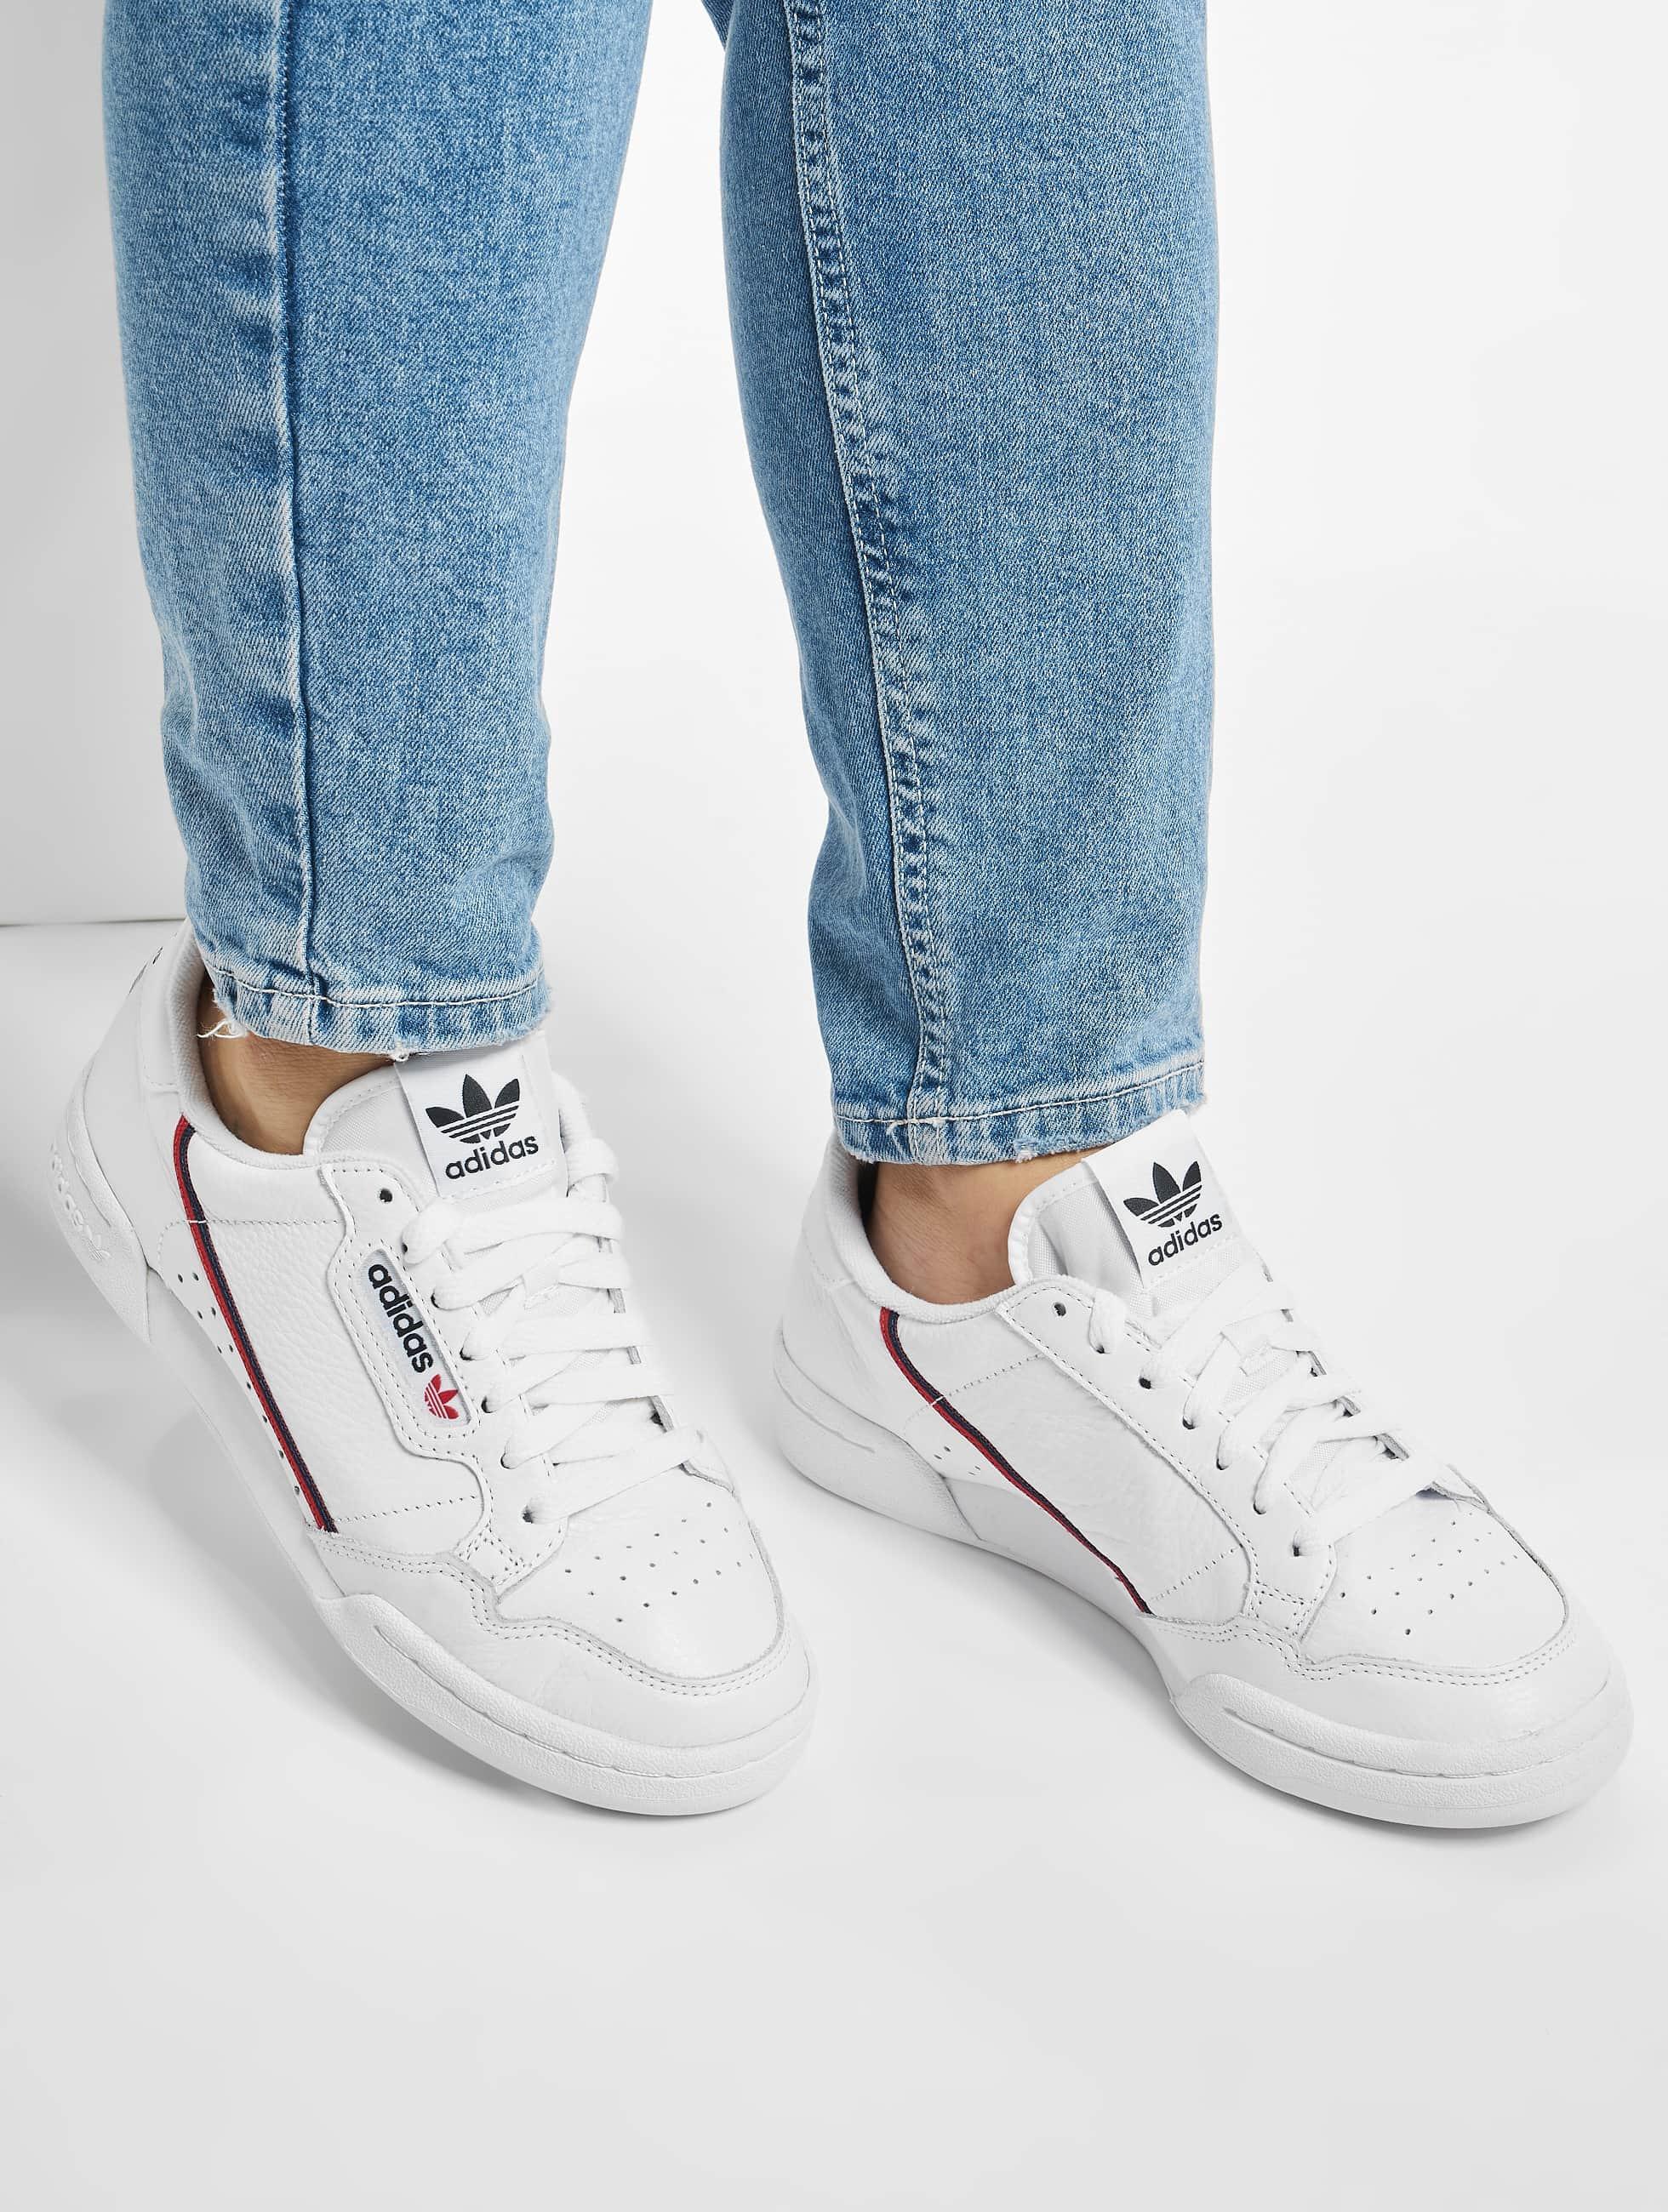 Adidas Originals Continental 80 Sneakers Ftwr White